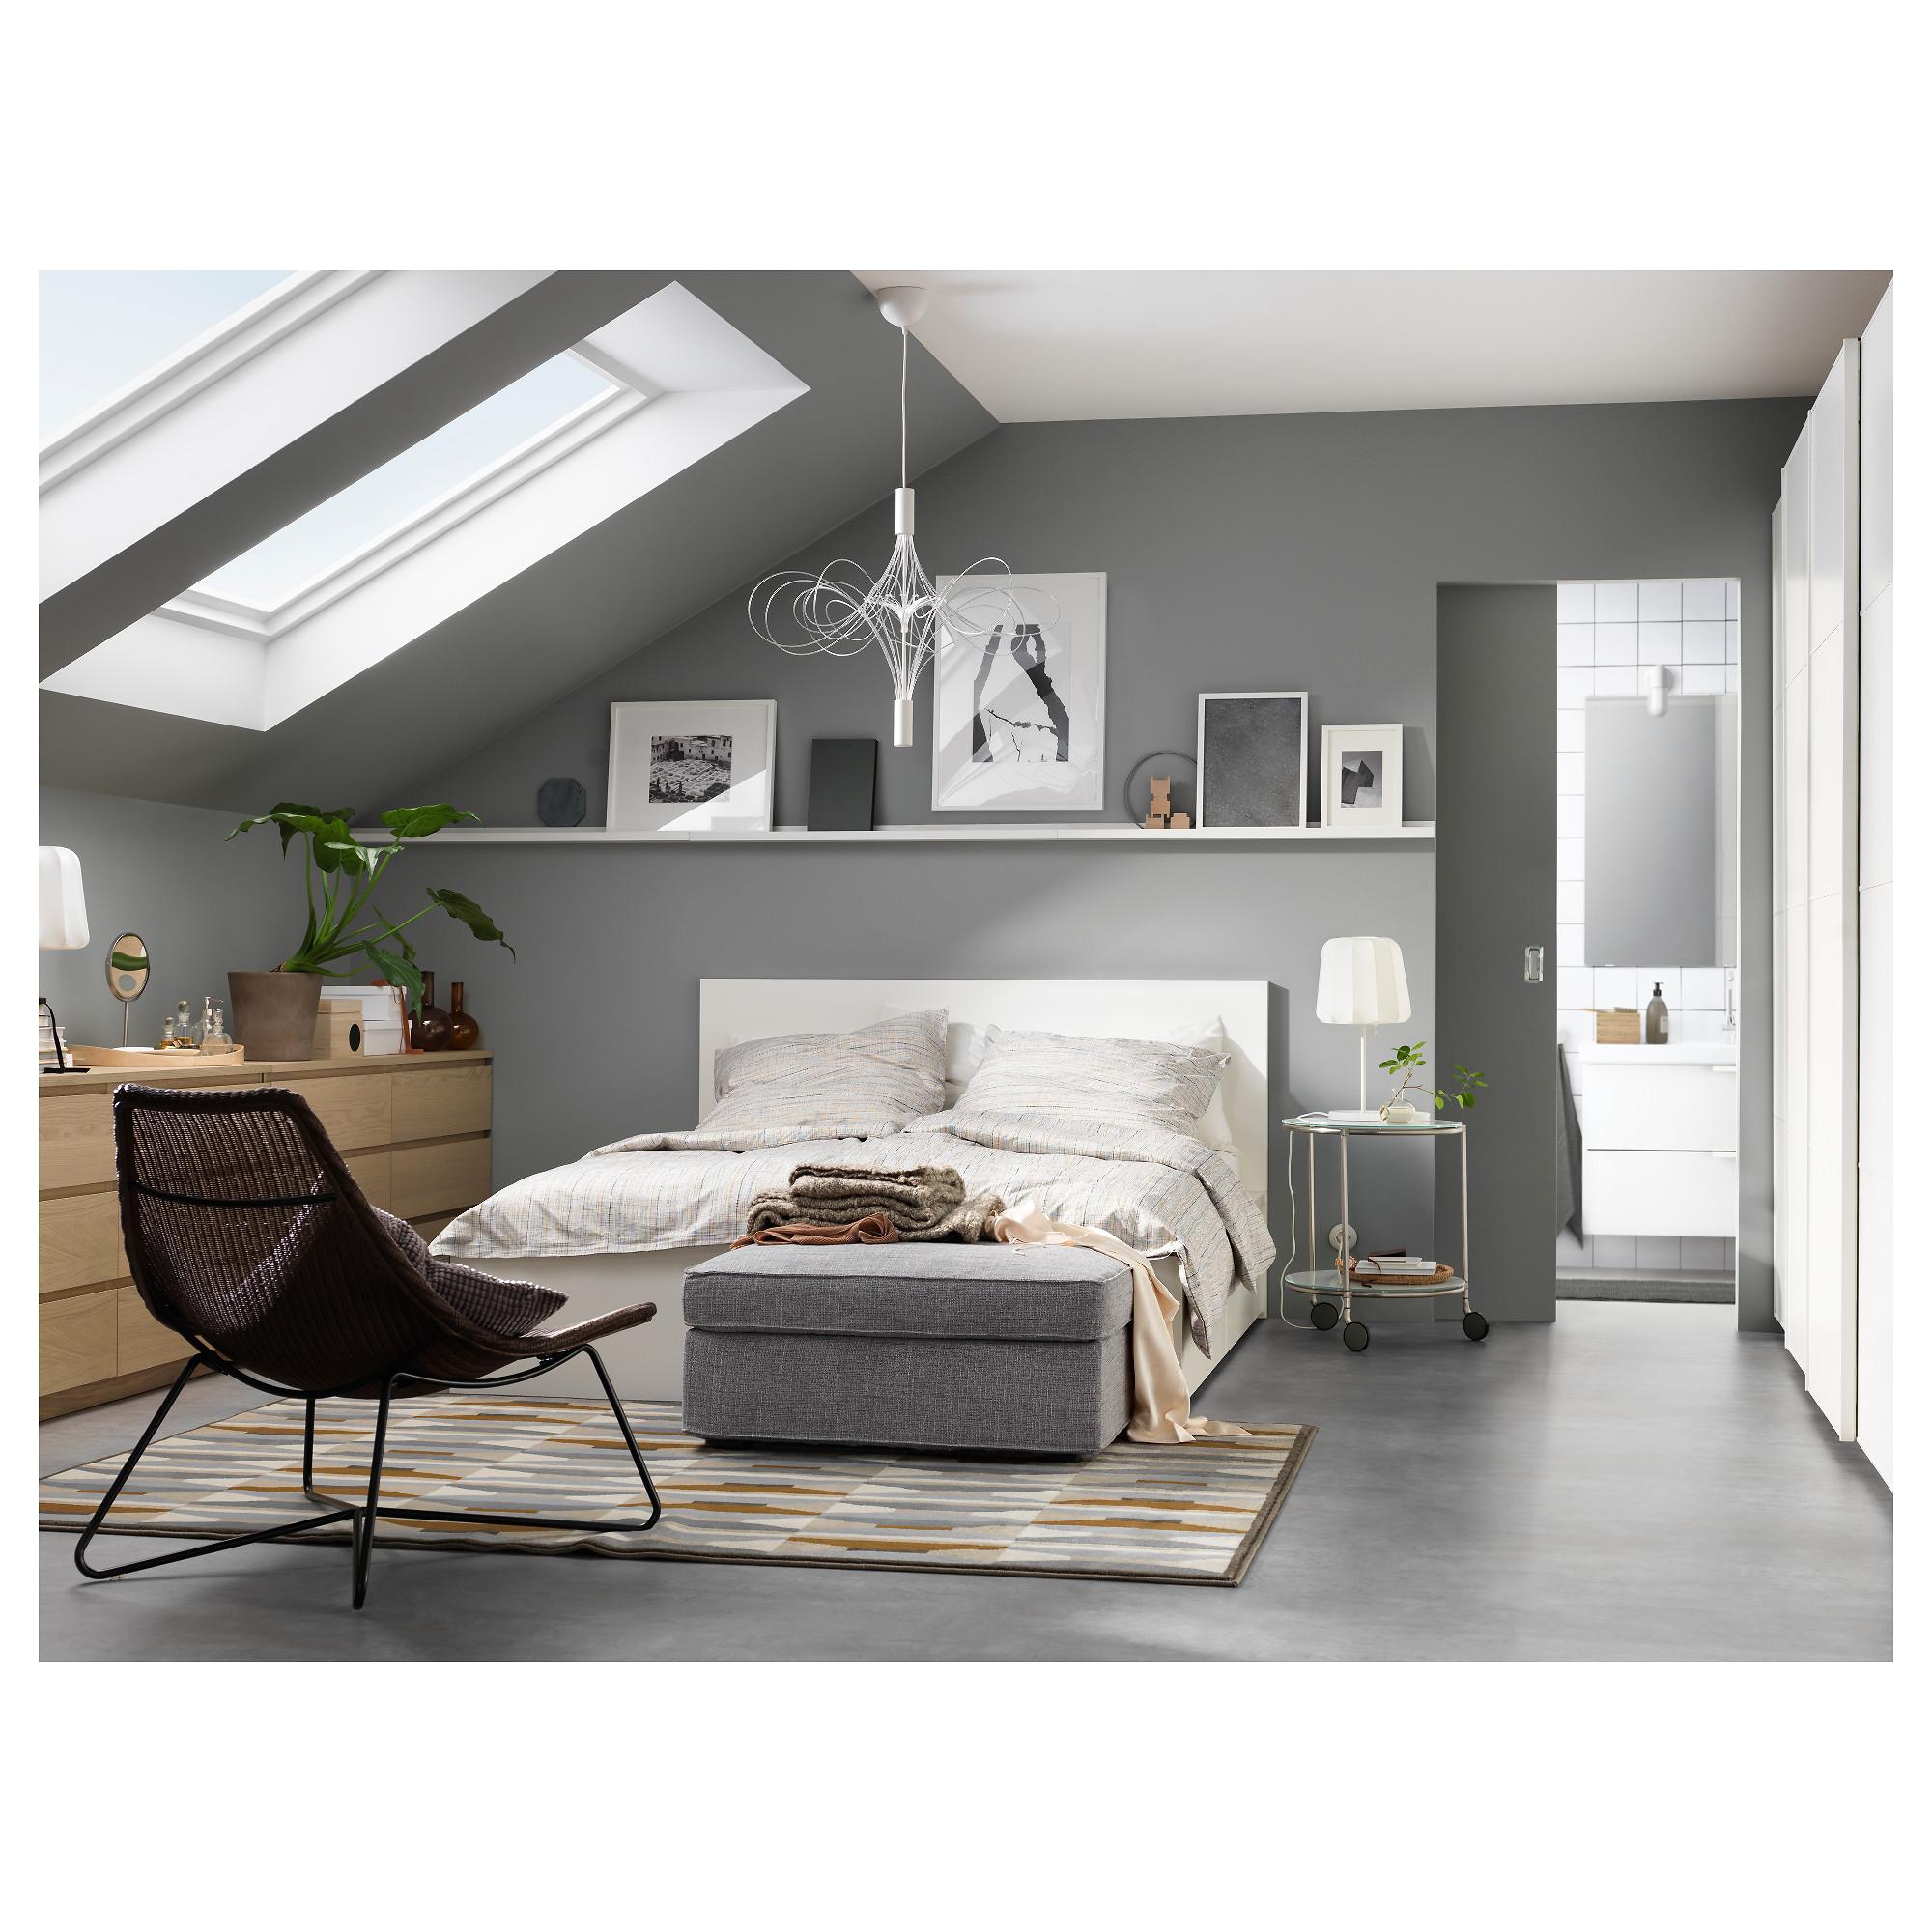 44 Ikea Master Bedroom Set Best Free